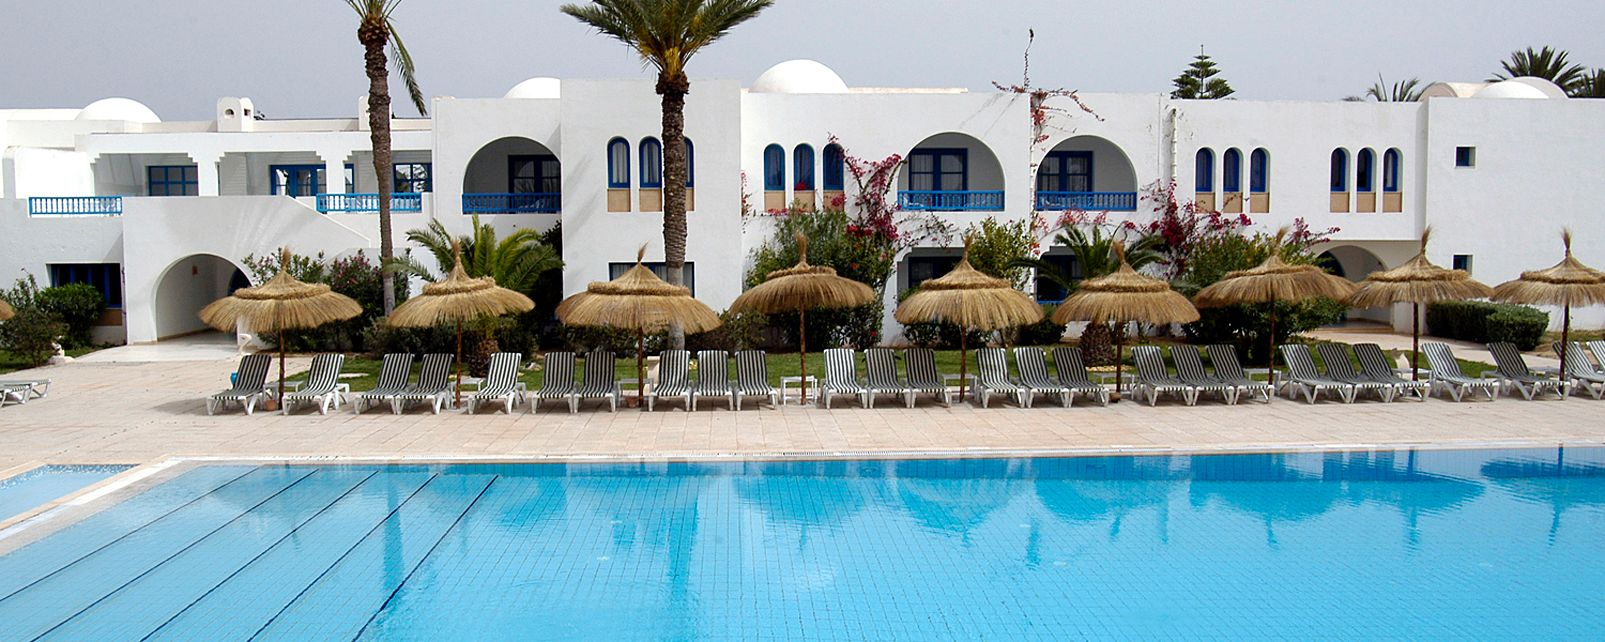 Hôtel Club El Manara